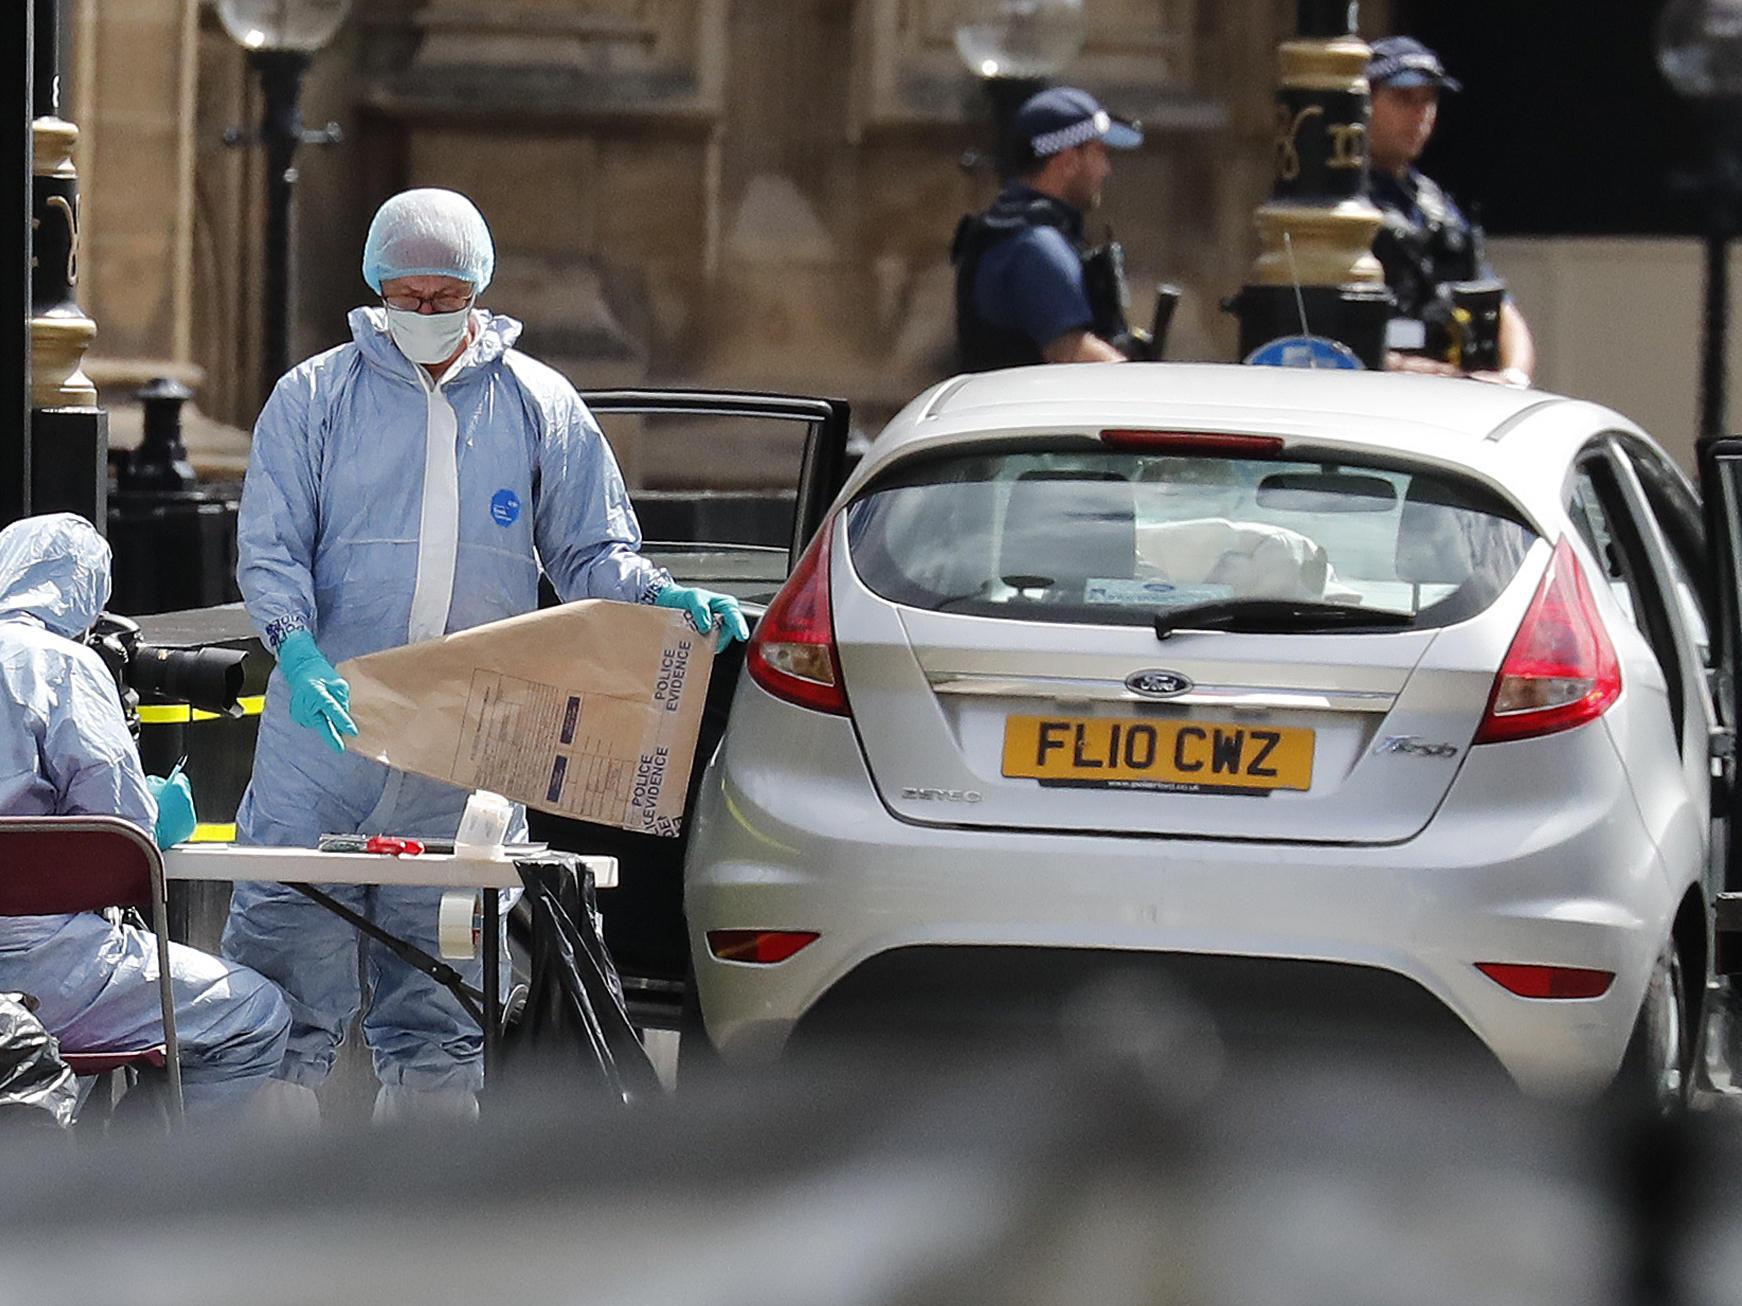 British Police Name Suspect In Crash At Parliament That Injured 3